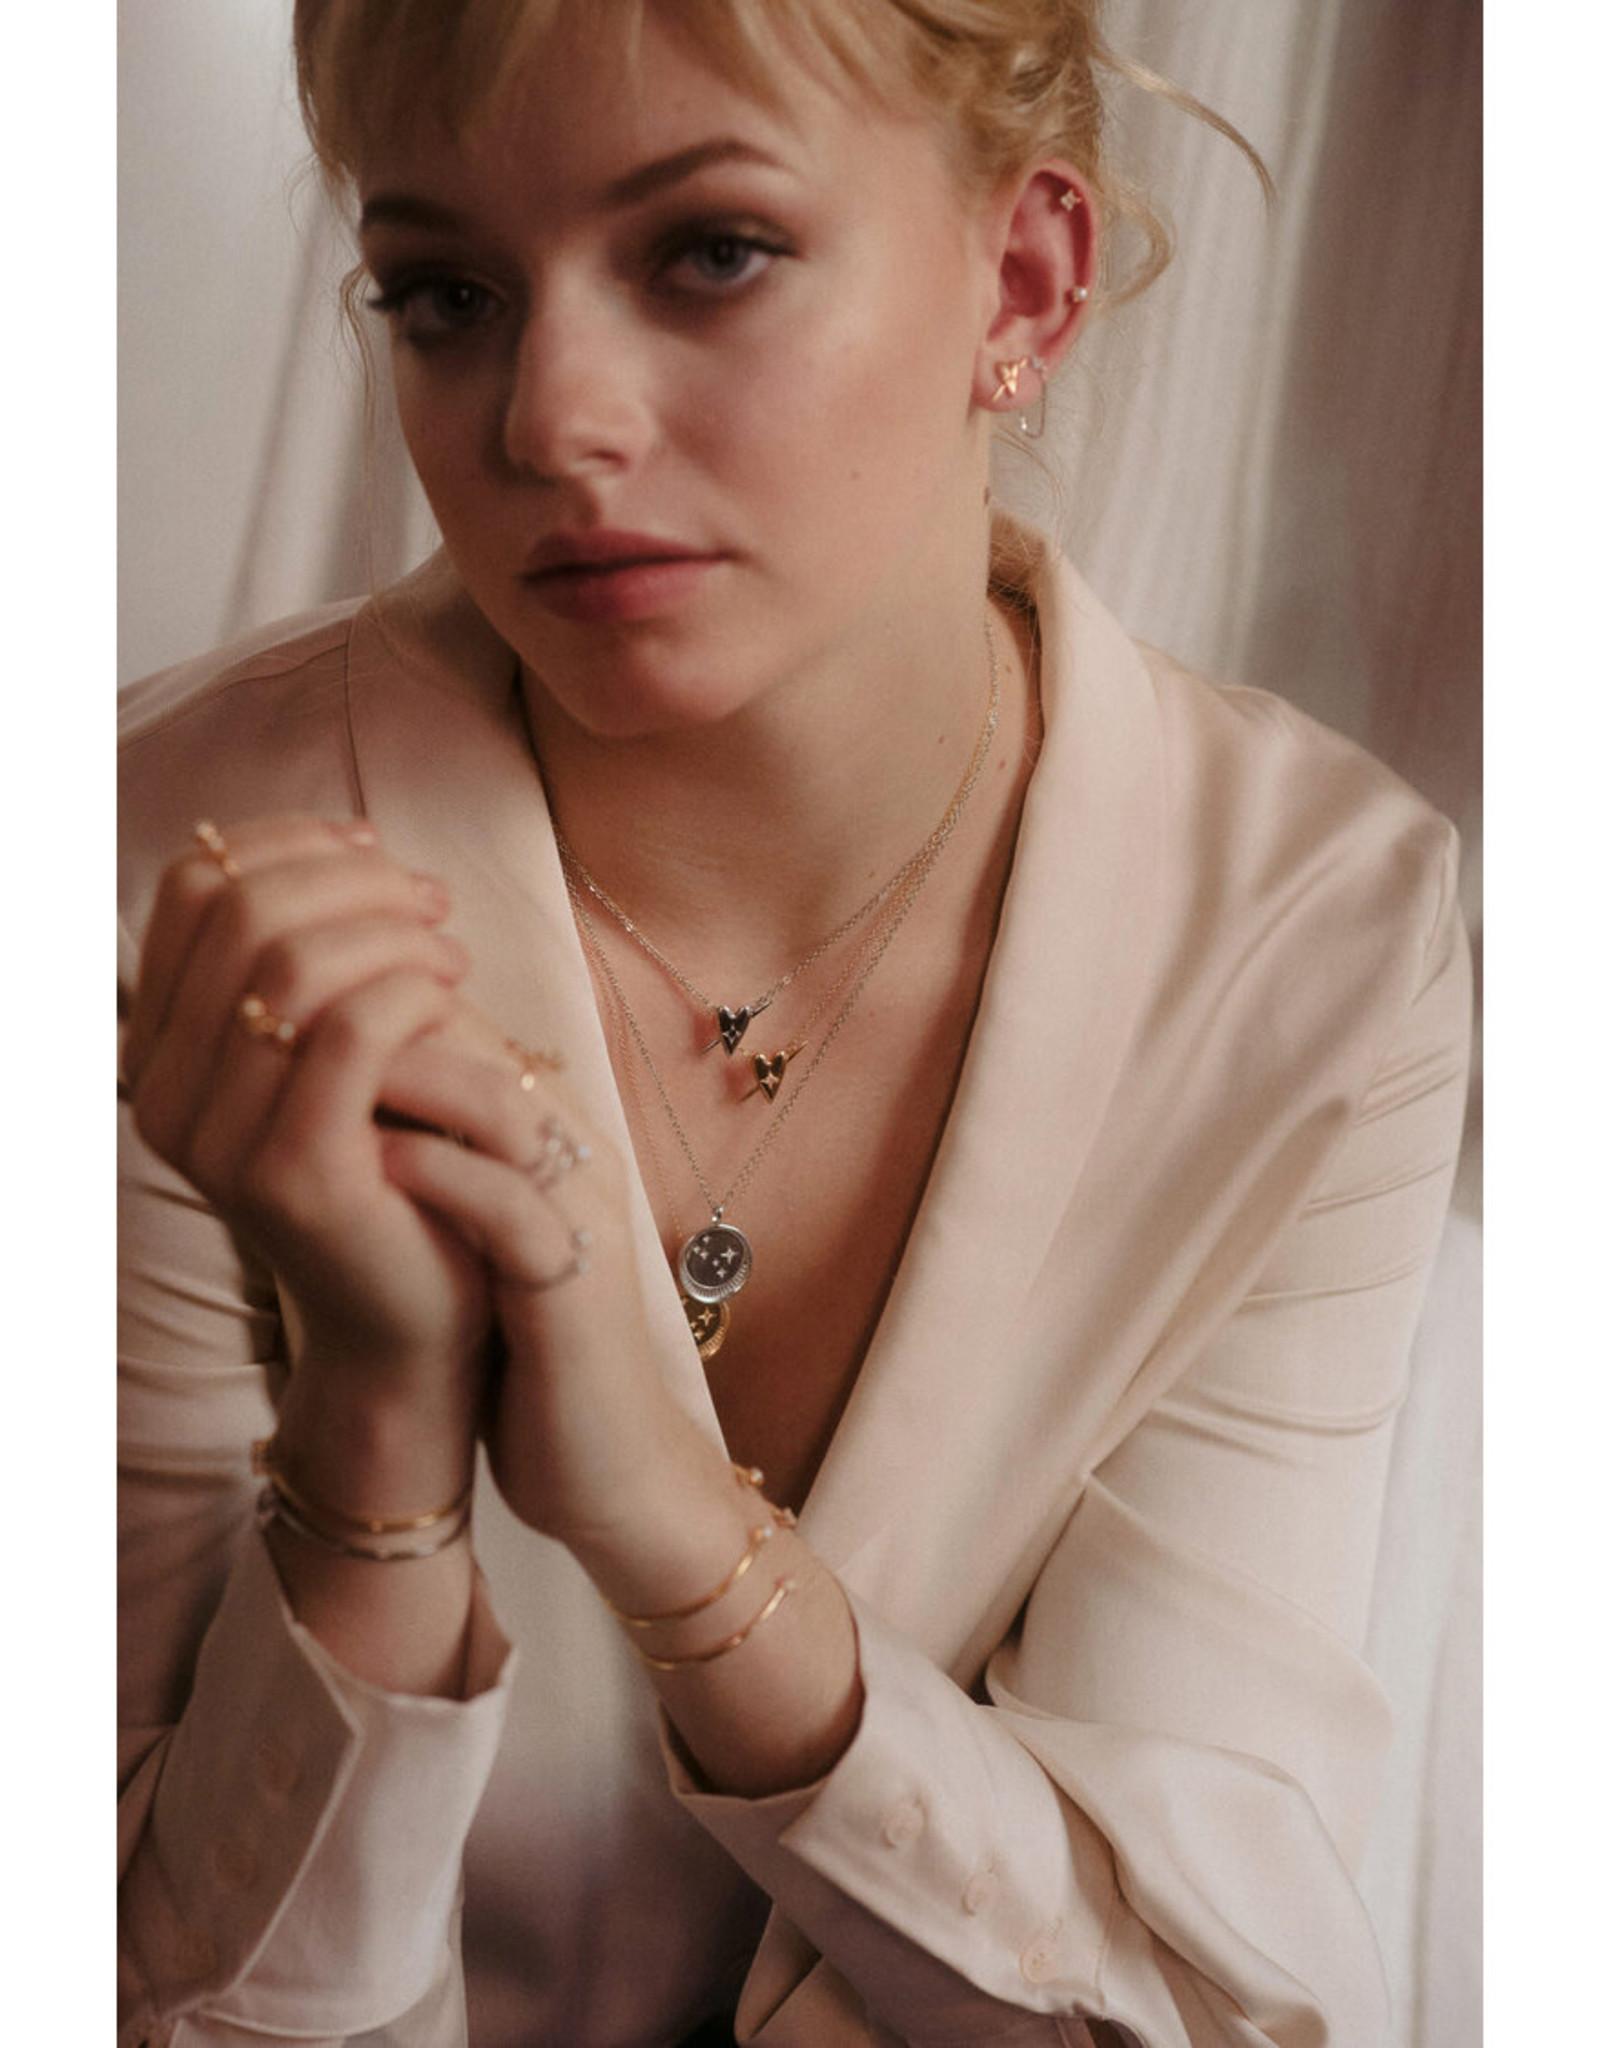 Sarah Mulder Jewelry Gold Alex Short Chain Studs - Onyx